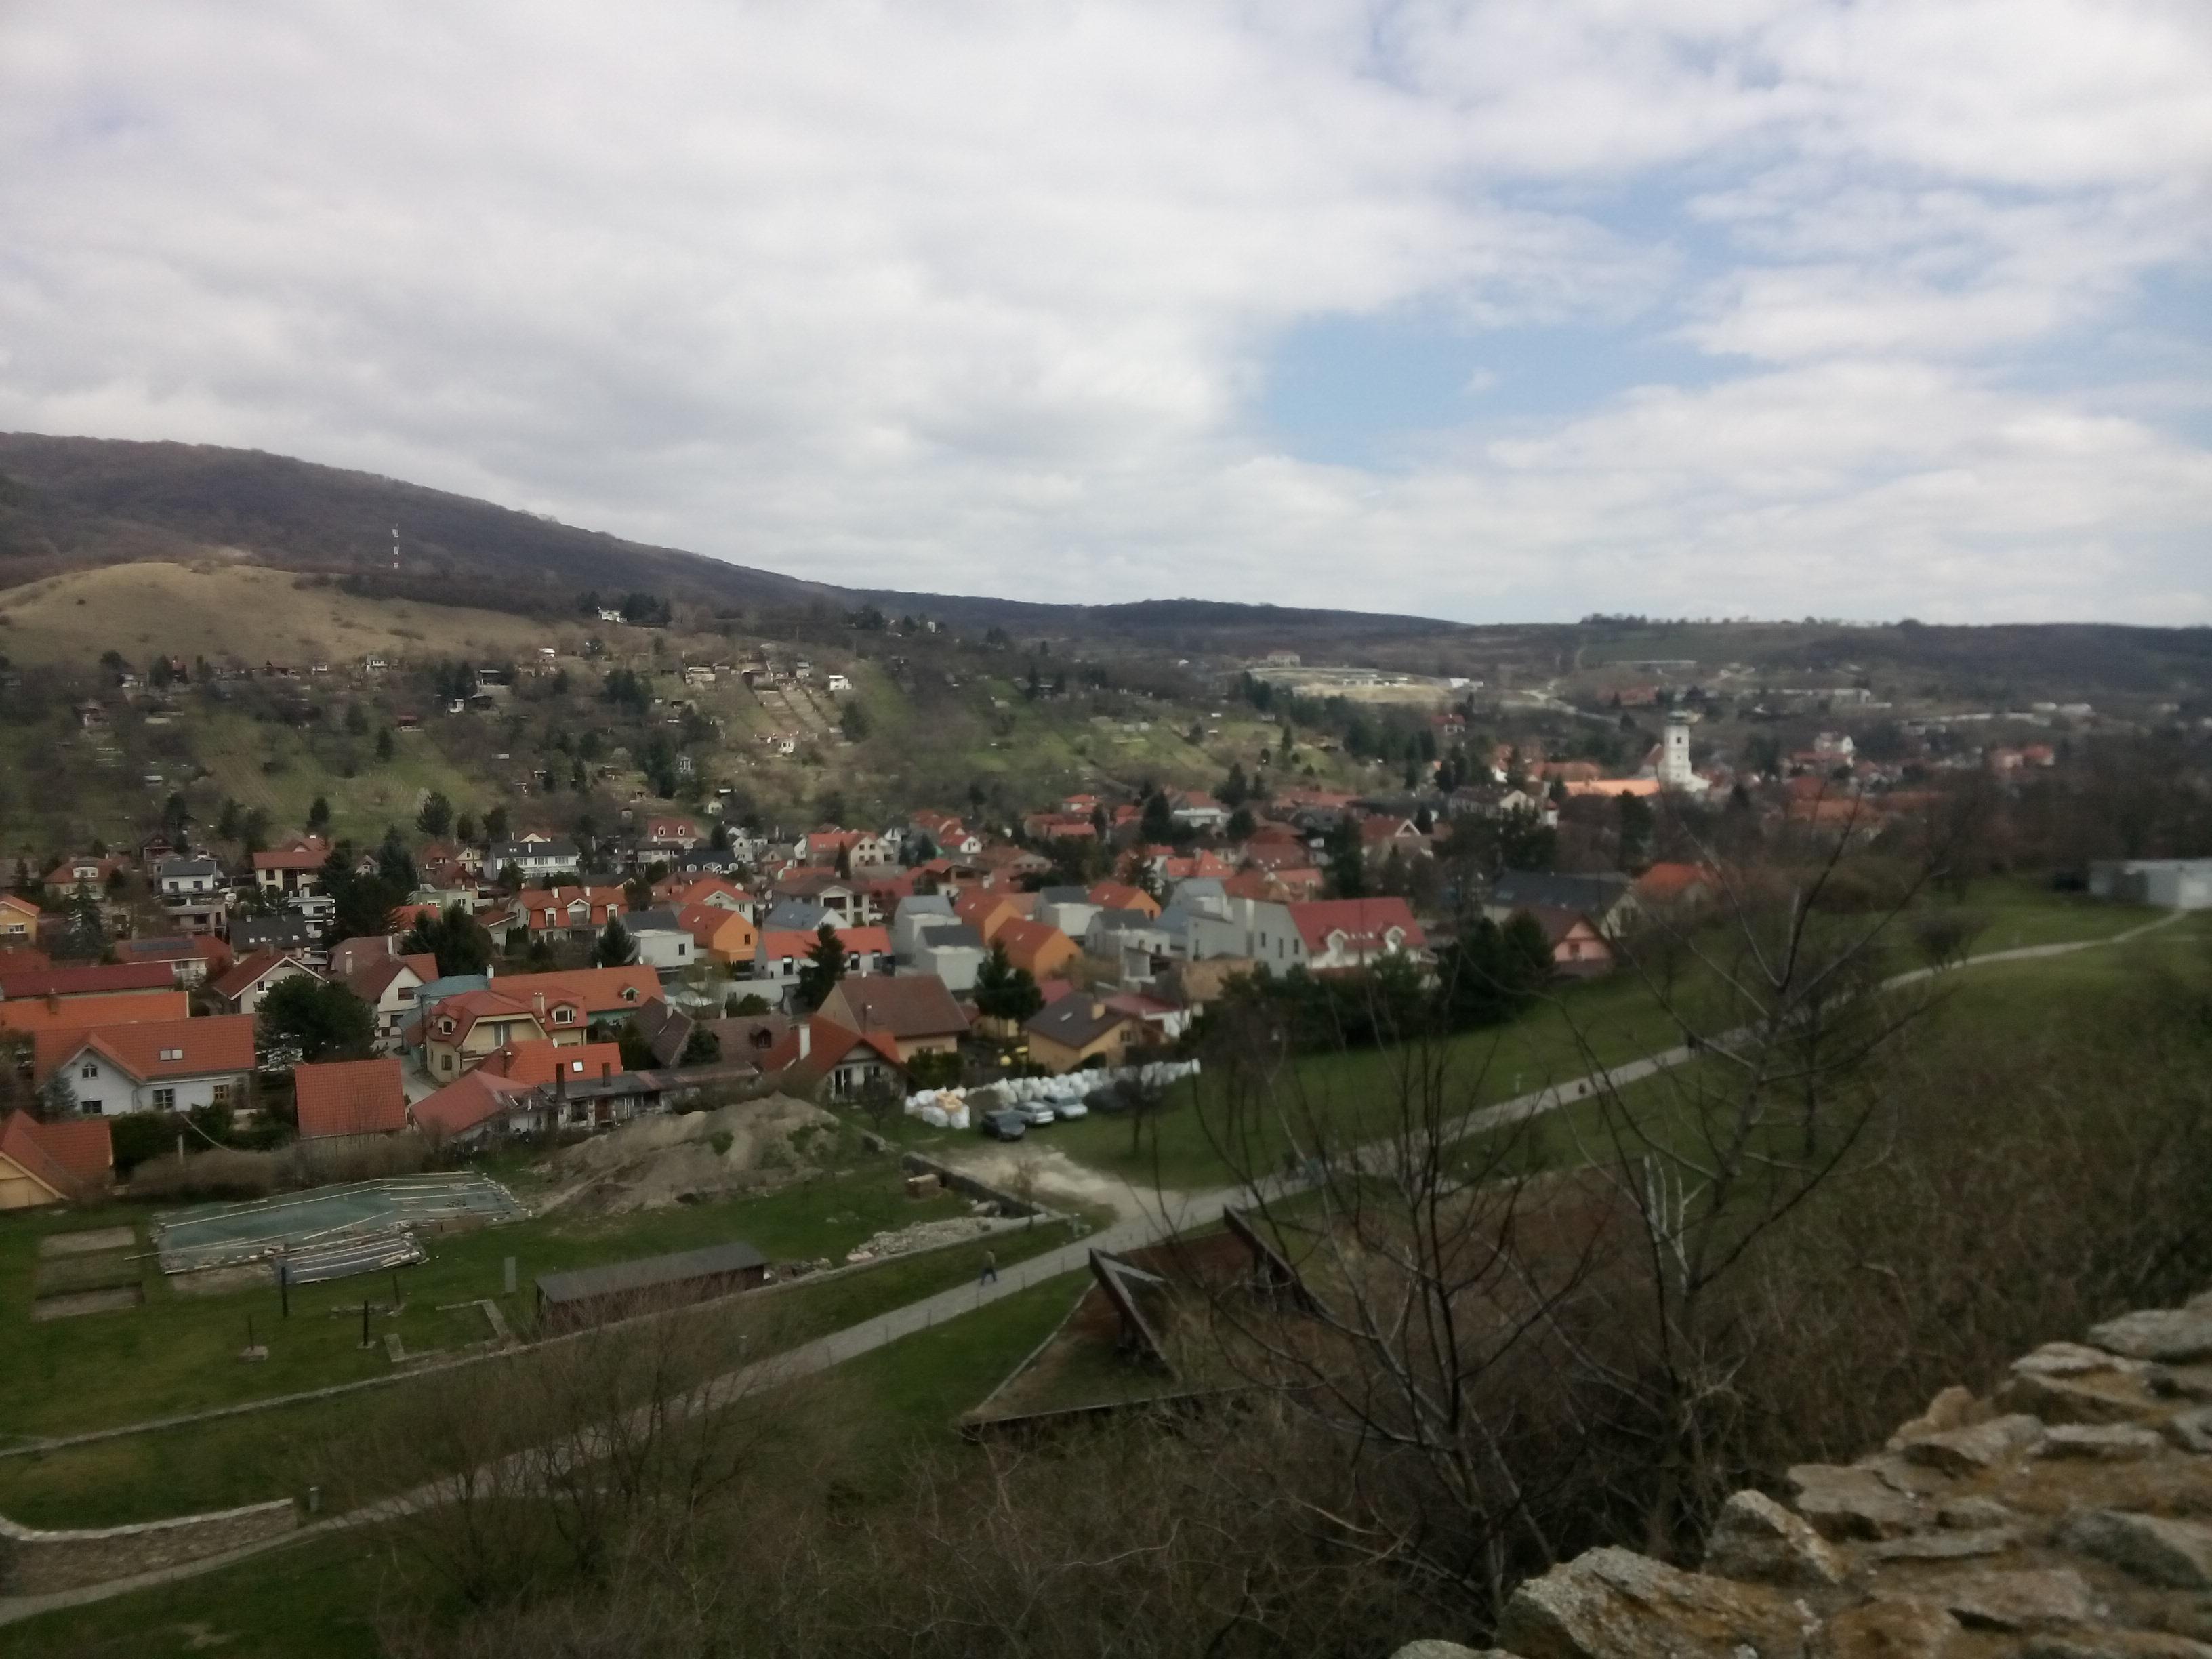 https://i.amy.gy/201804-slovakia-austria-czech/IMG_20180406_125505.jpg